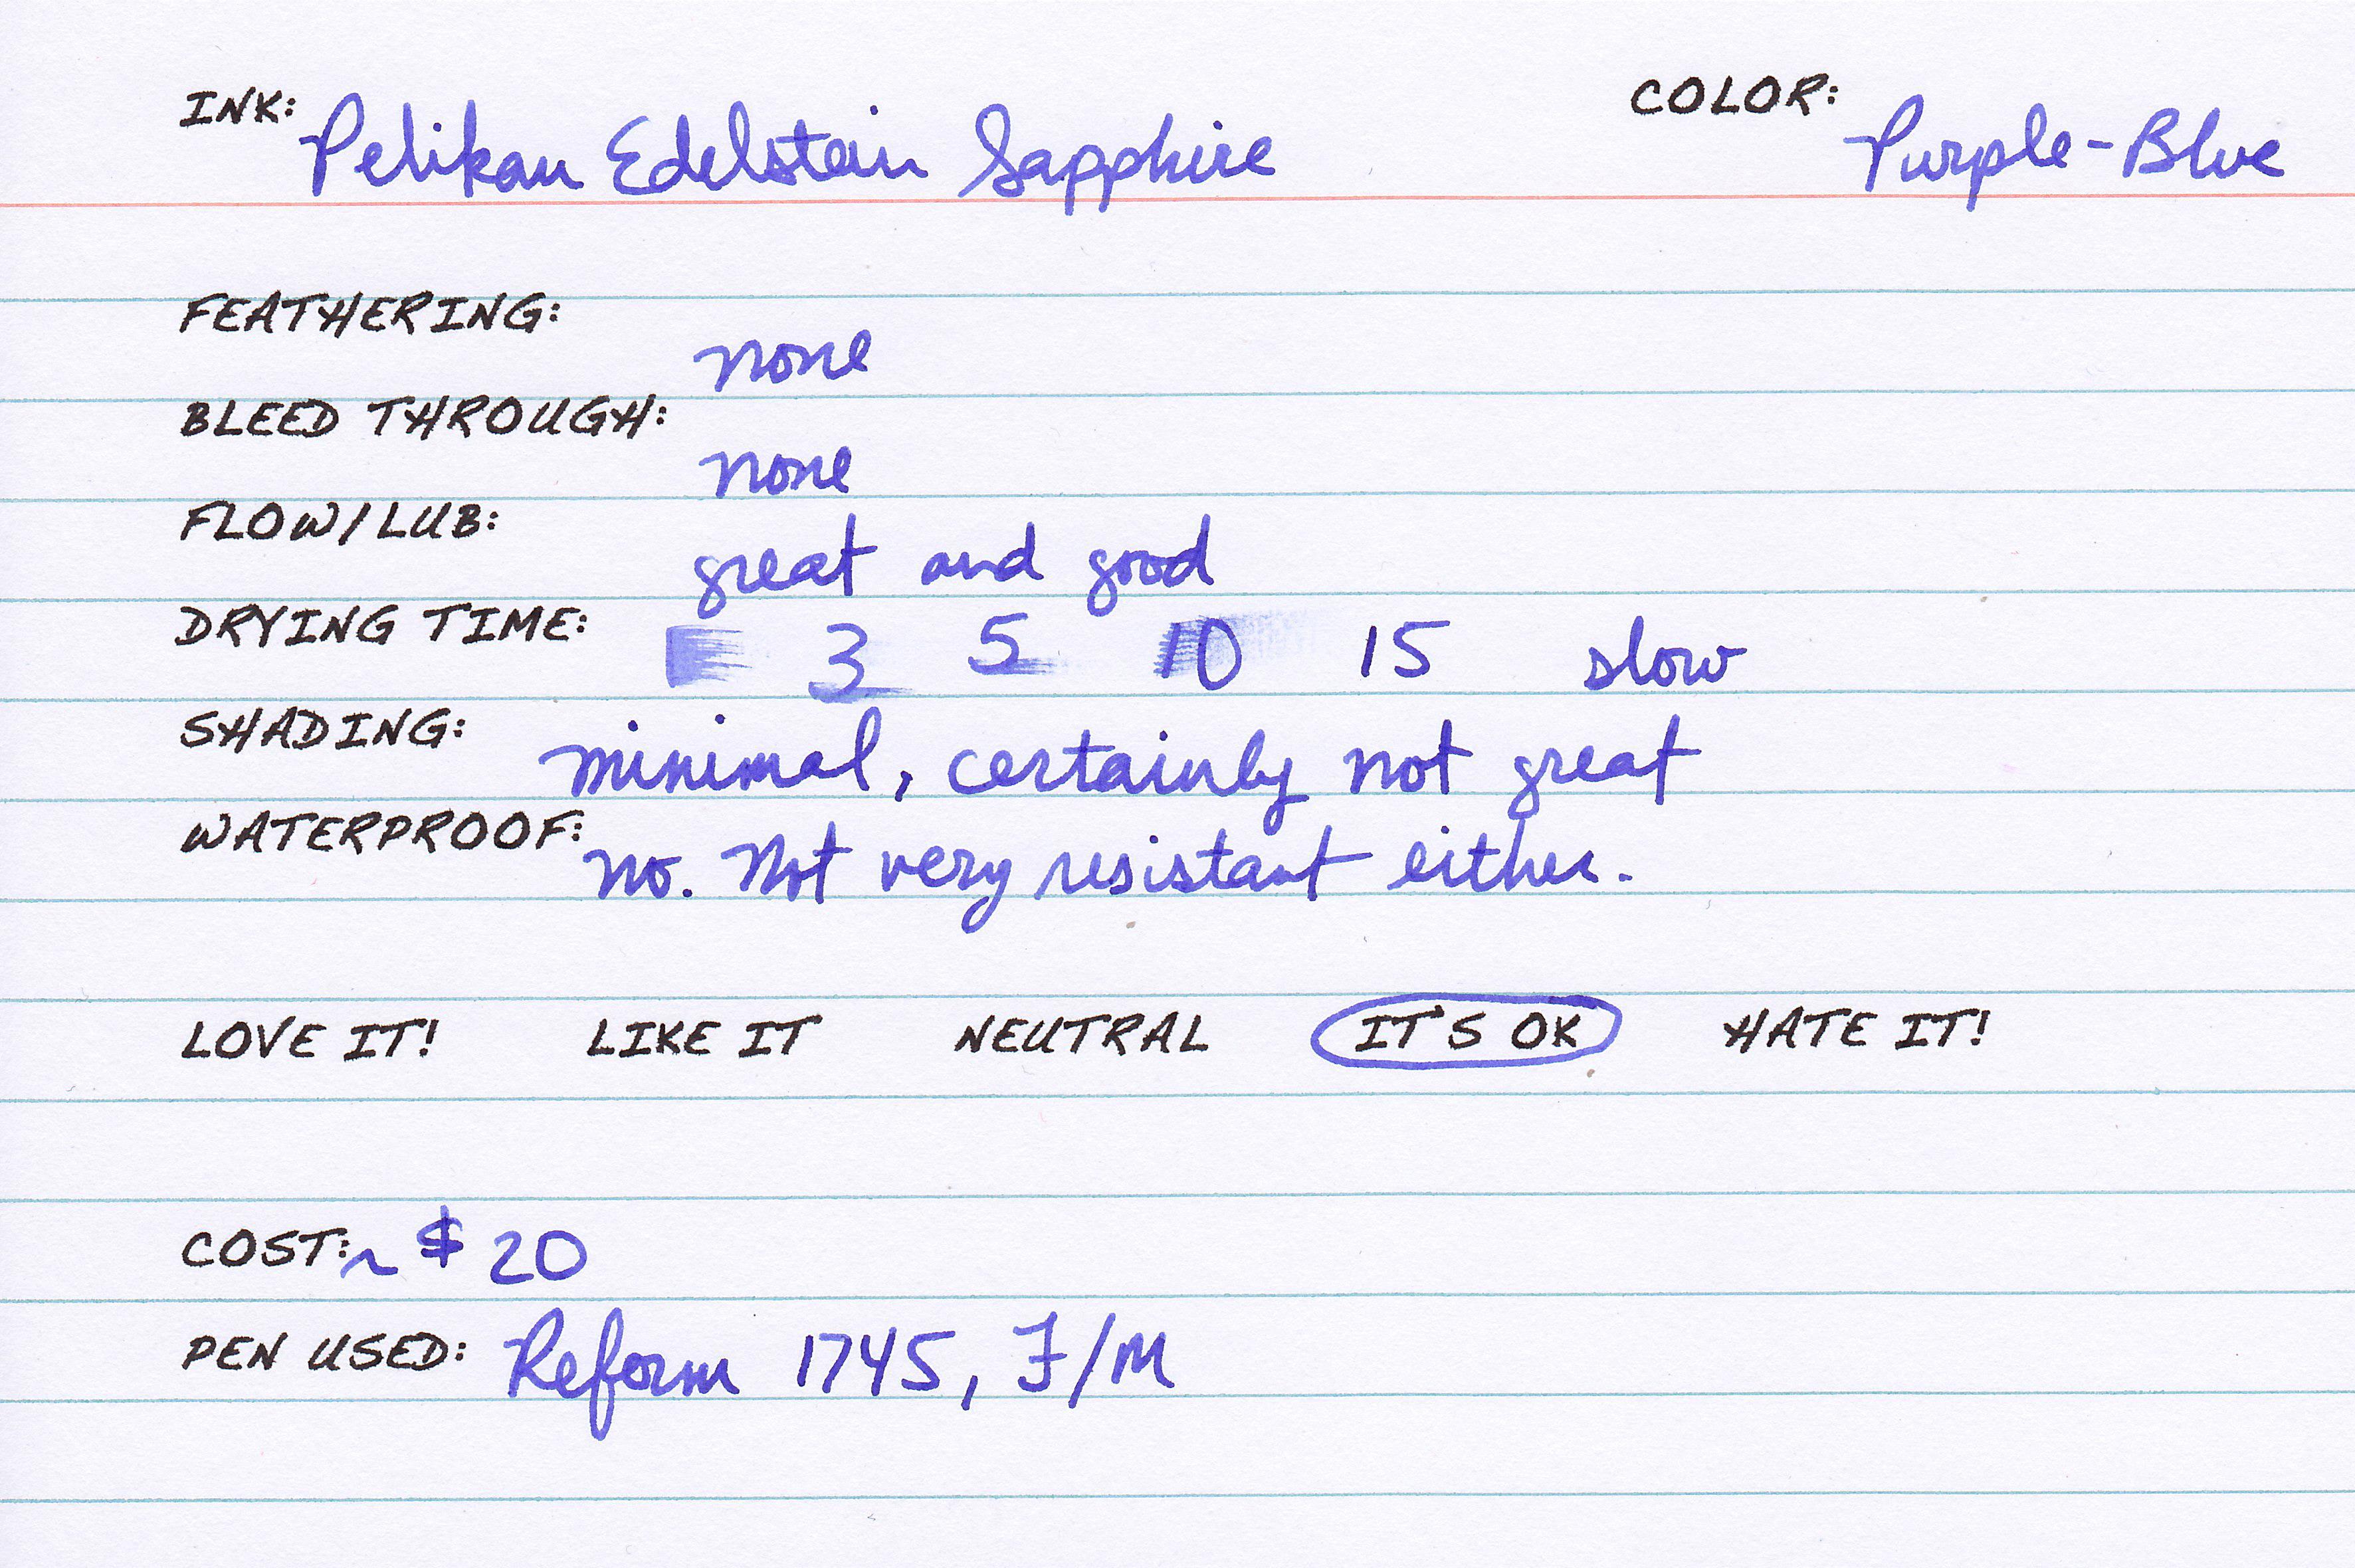 Pelikan Edelstein Sapphire The Dizzy Pen